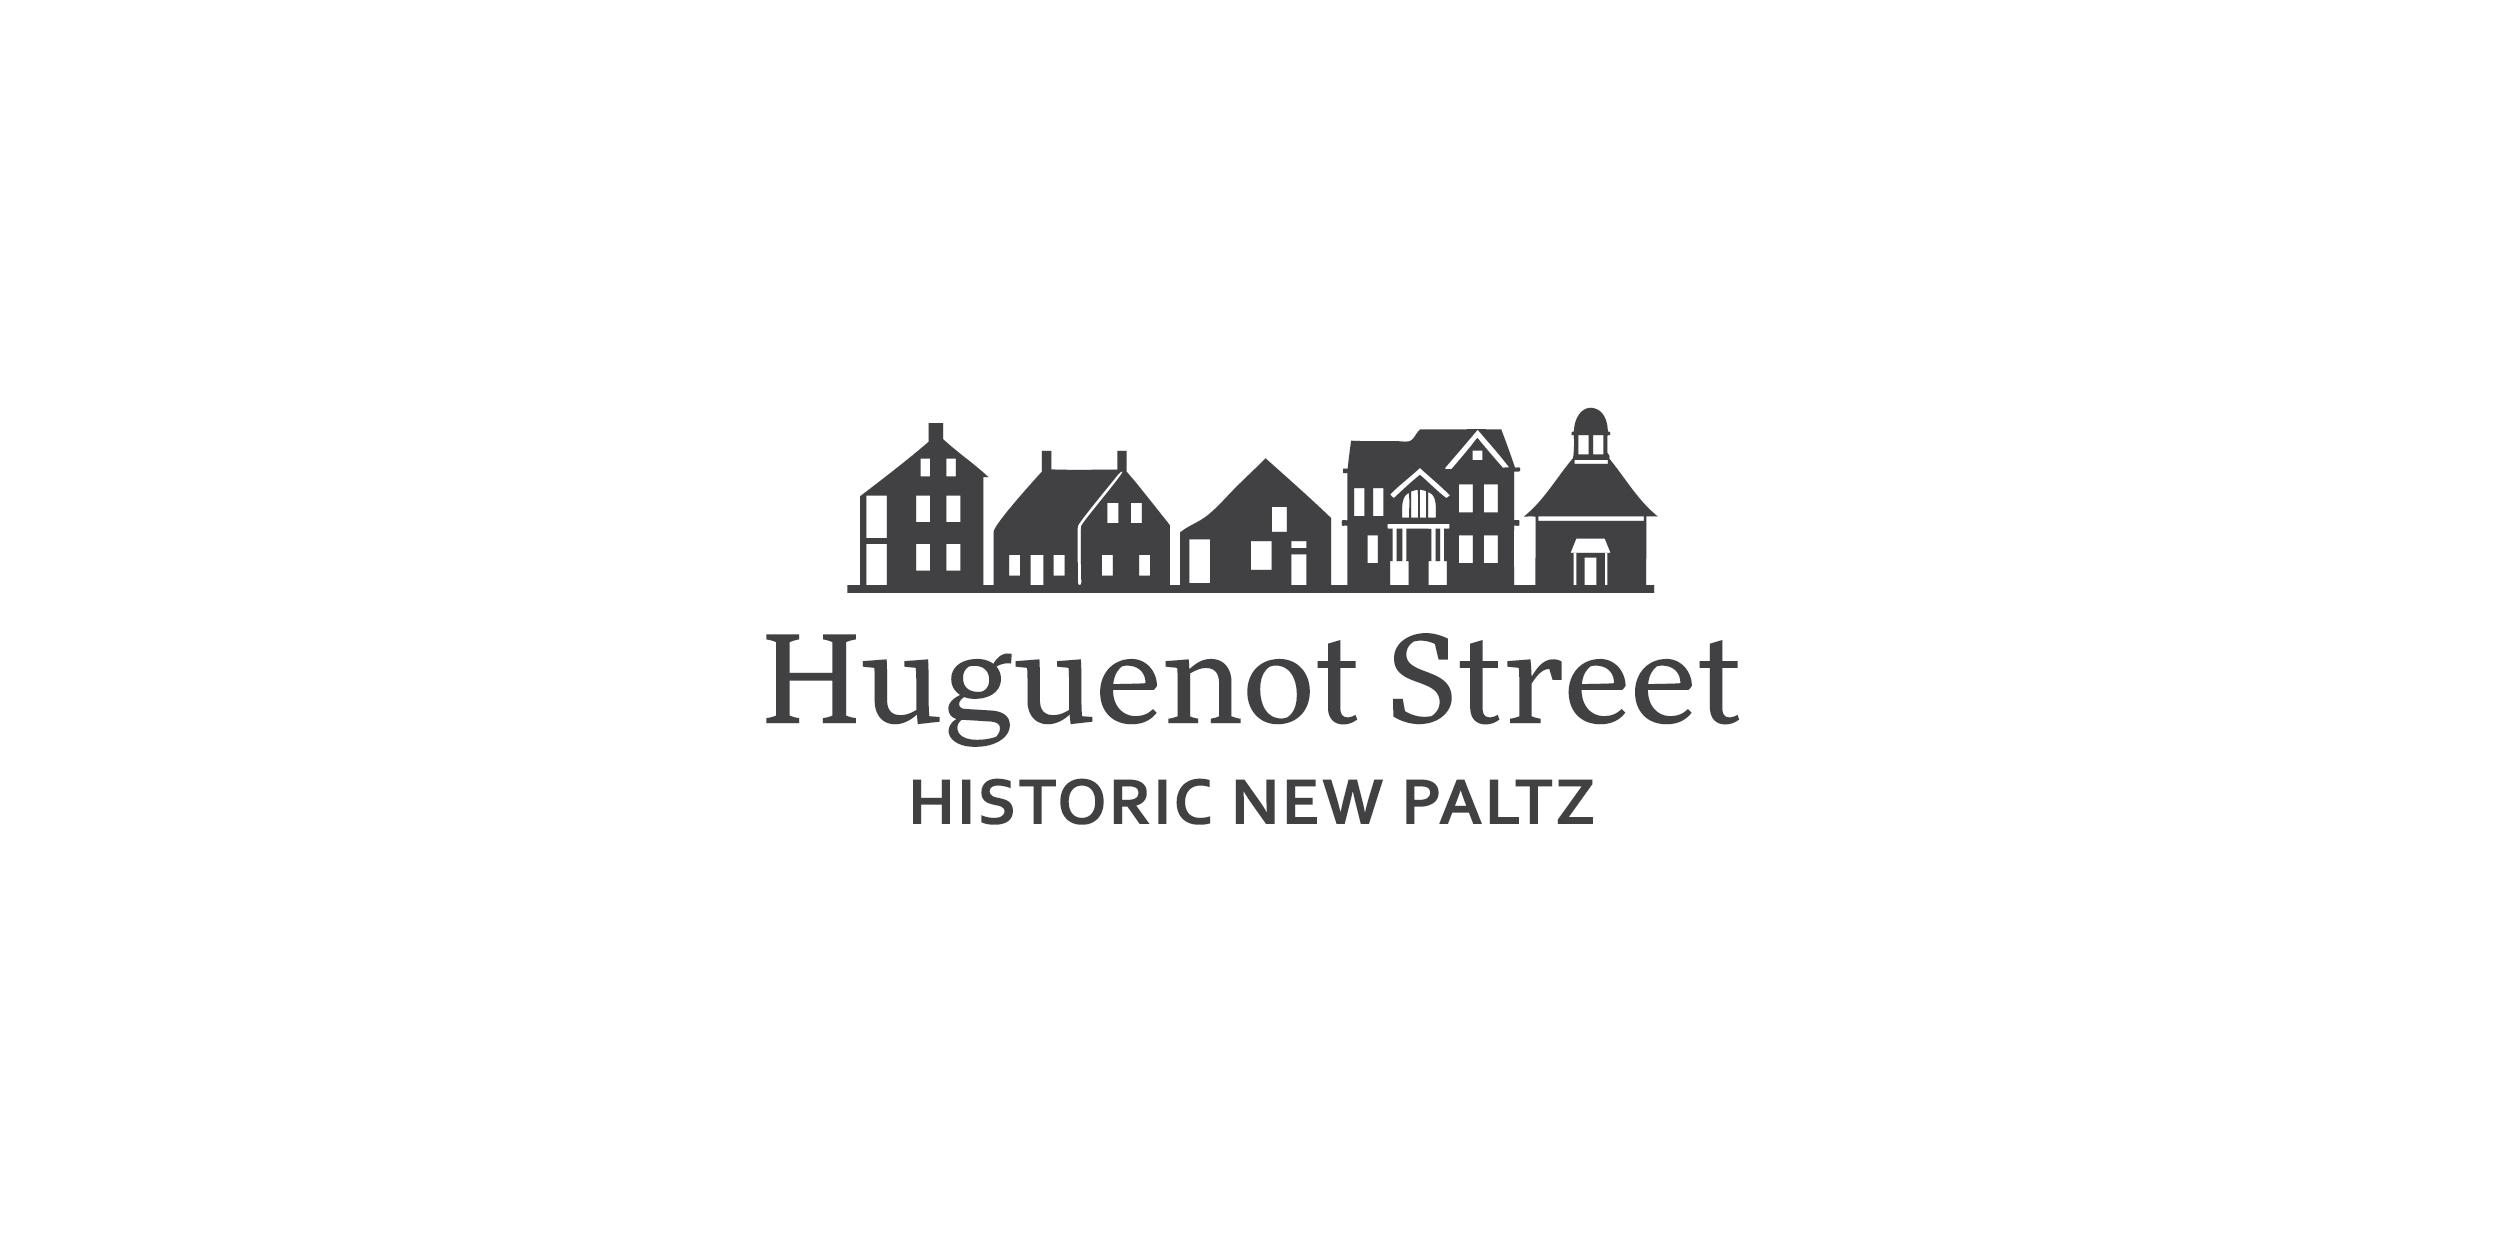 Copy of Doen Creative Logo Design Historic Huguenot Street